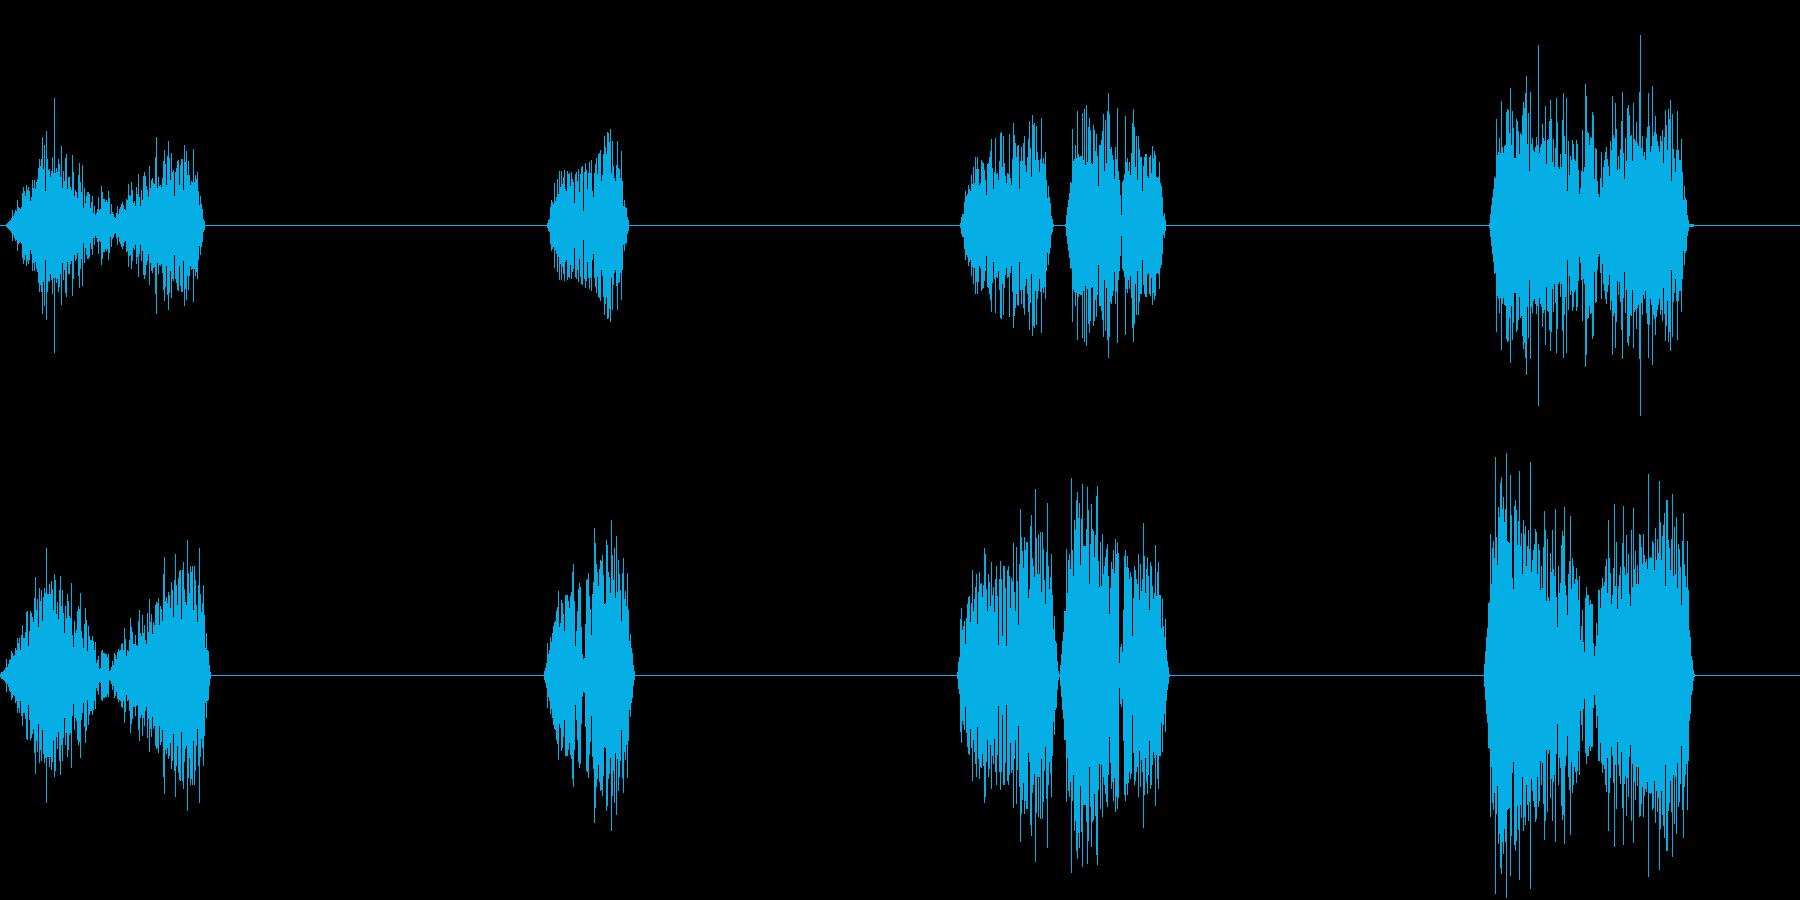 DJプレイ スクラッチ・ノイズ 10の再生済みの波形